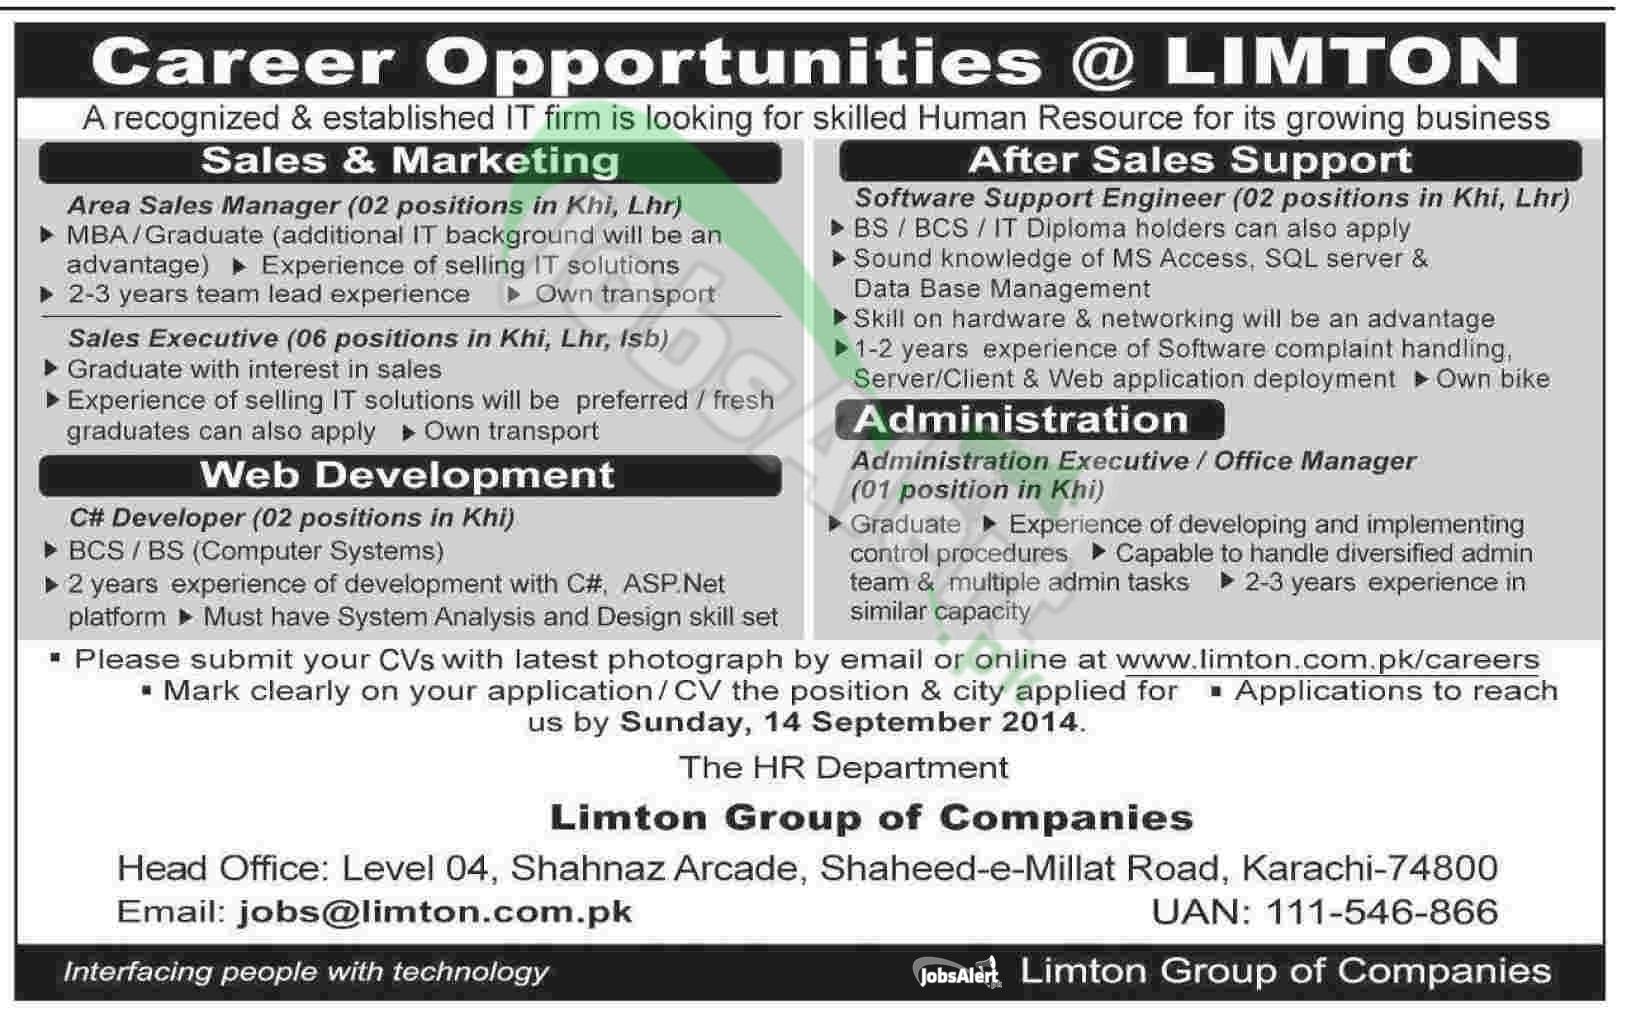 Limton Group of Companies